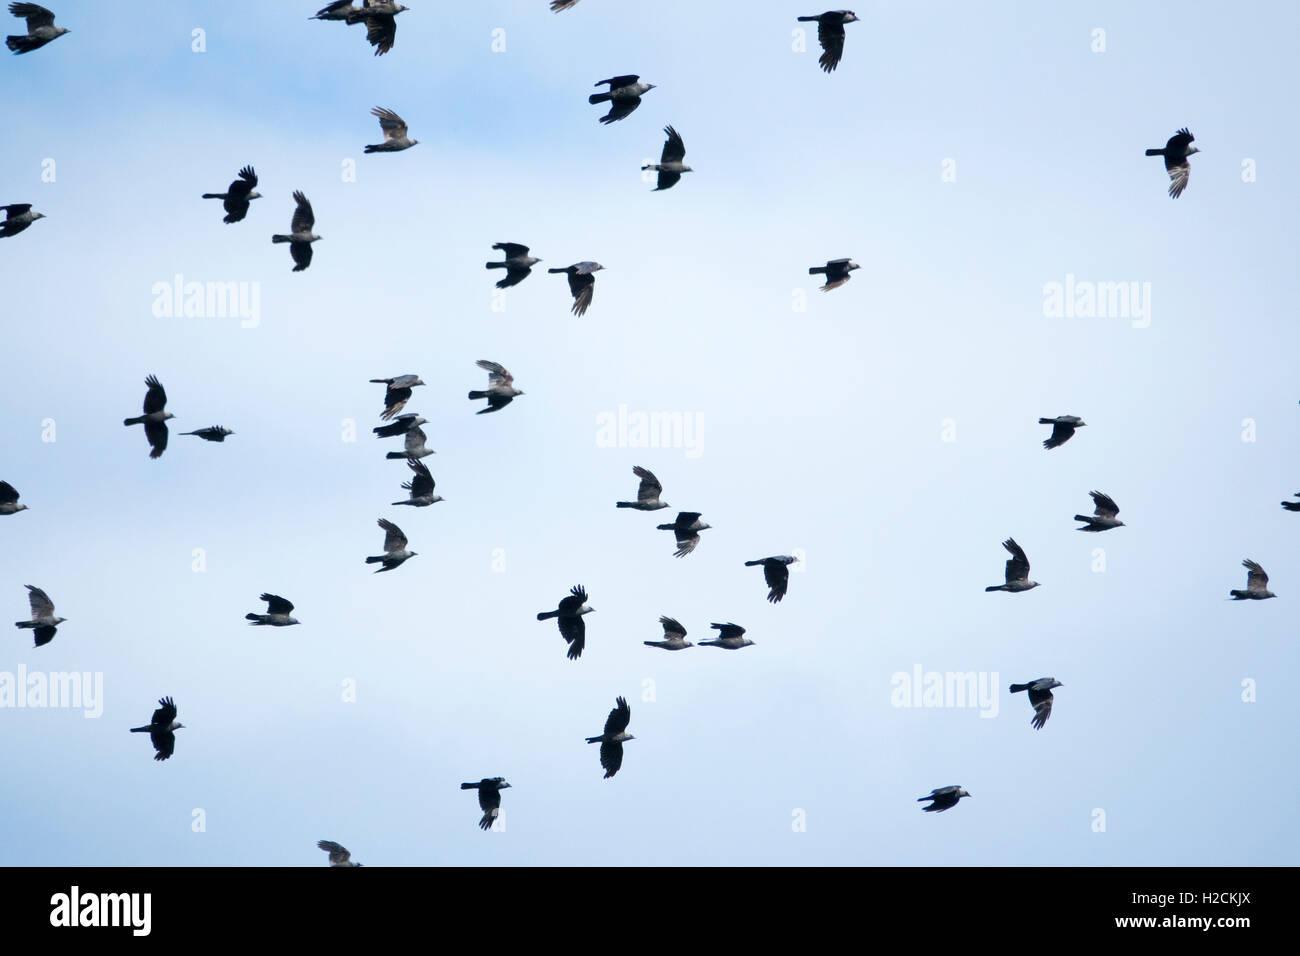 Flock of birds flying in the sky - Stock Image